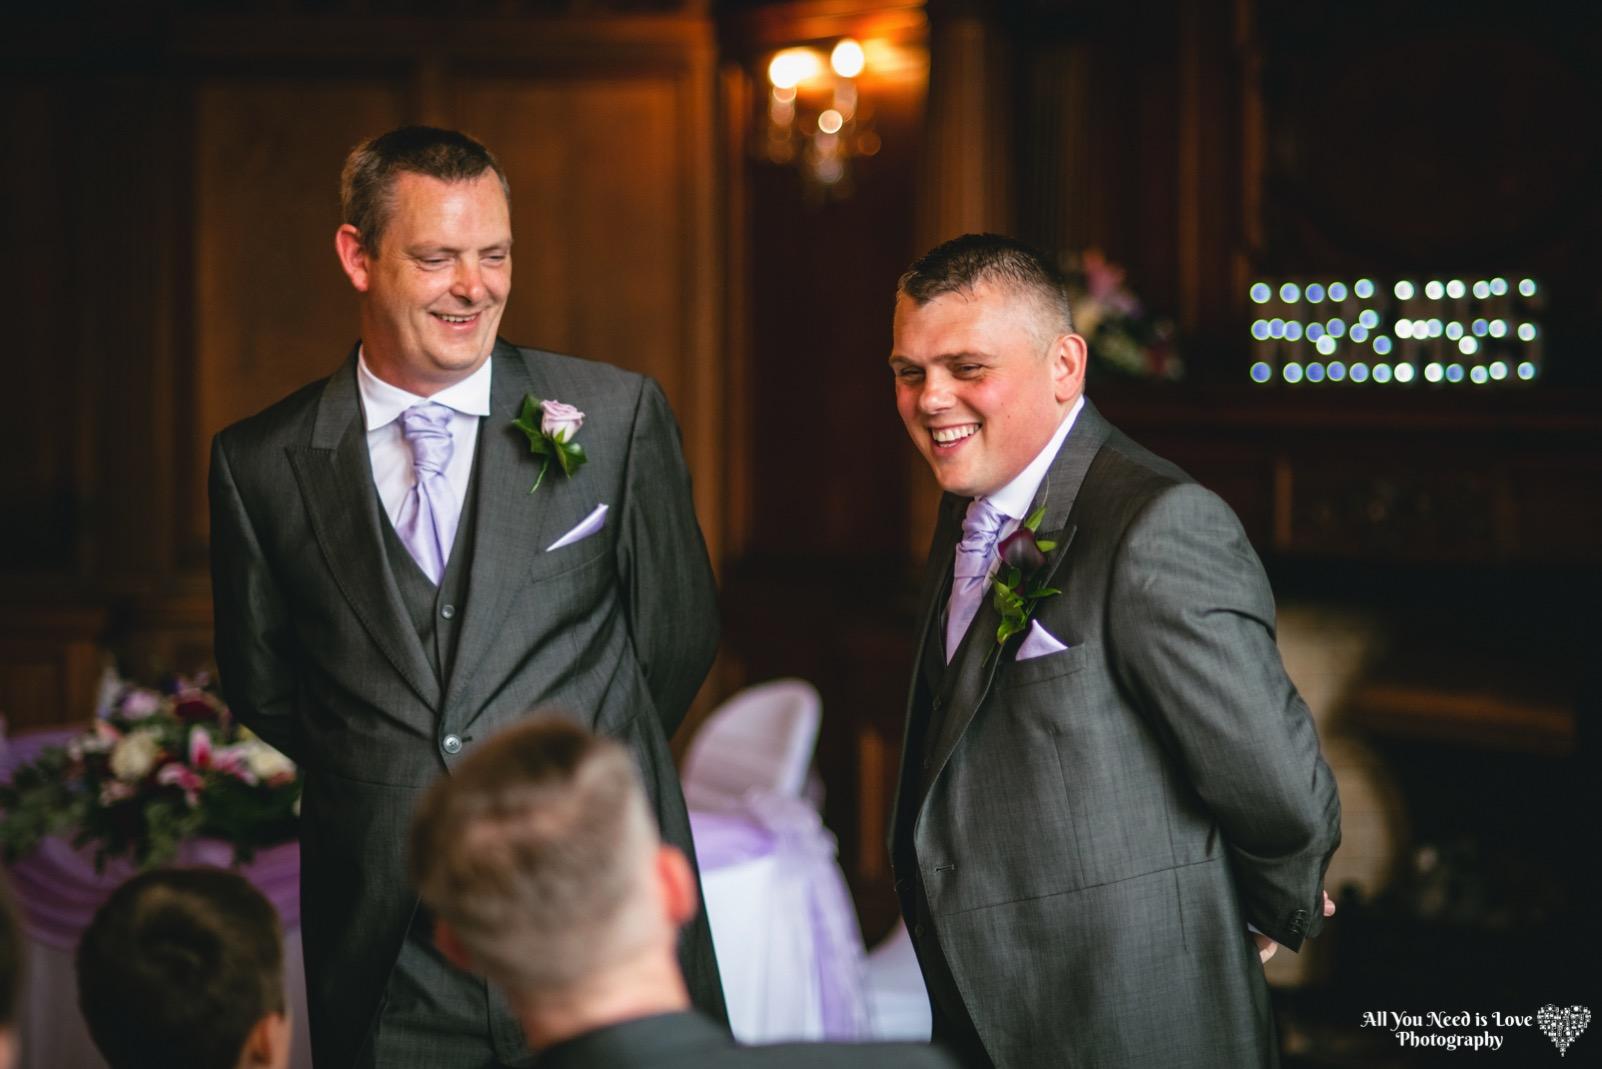 Professional York Wedding Photographer